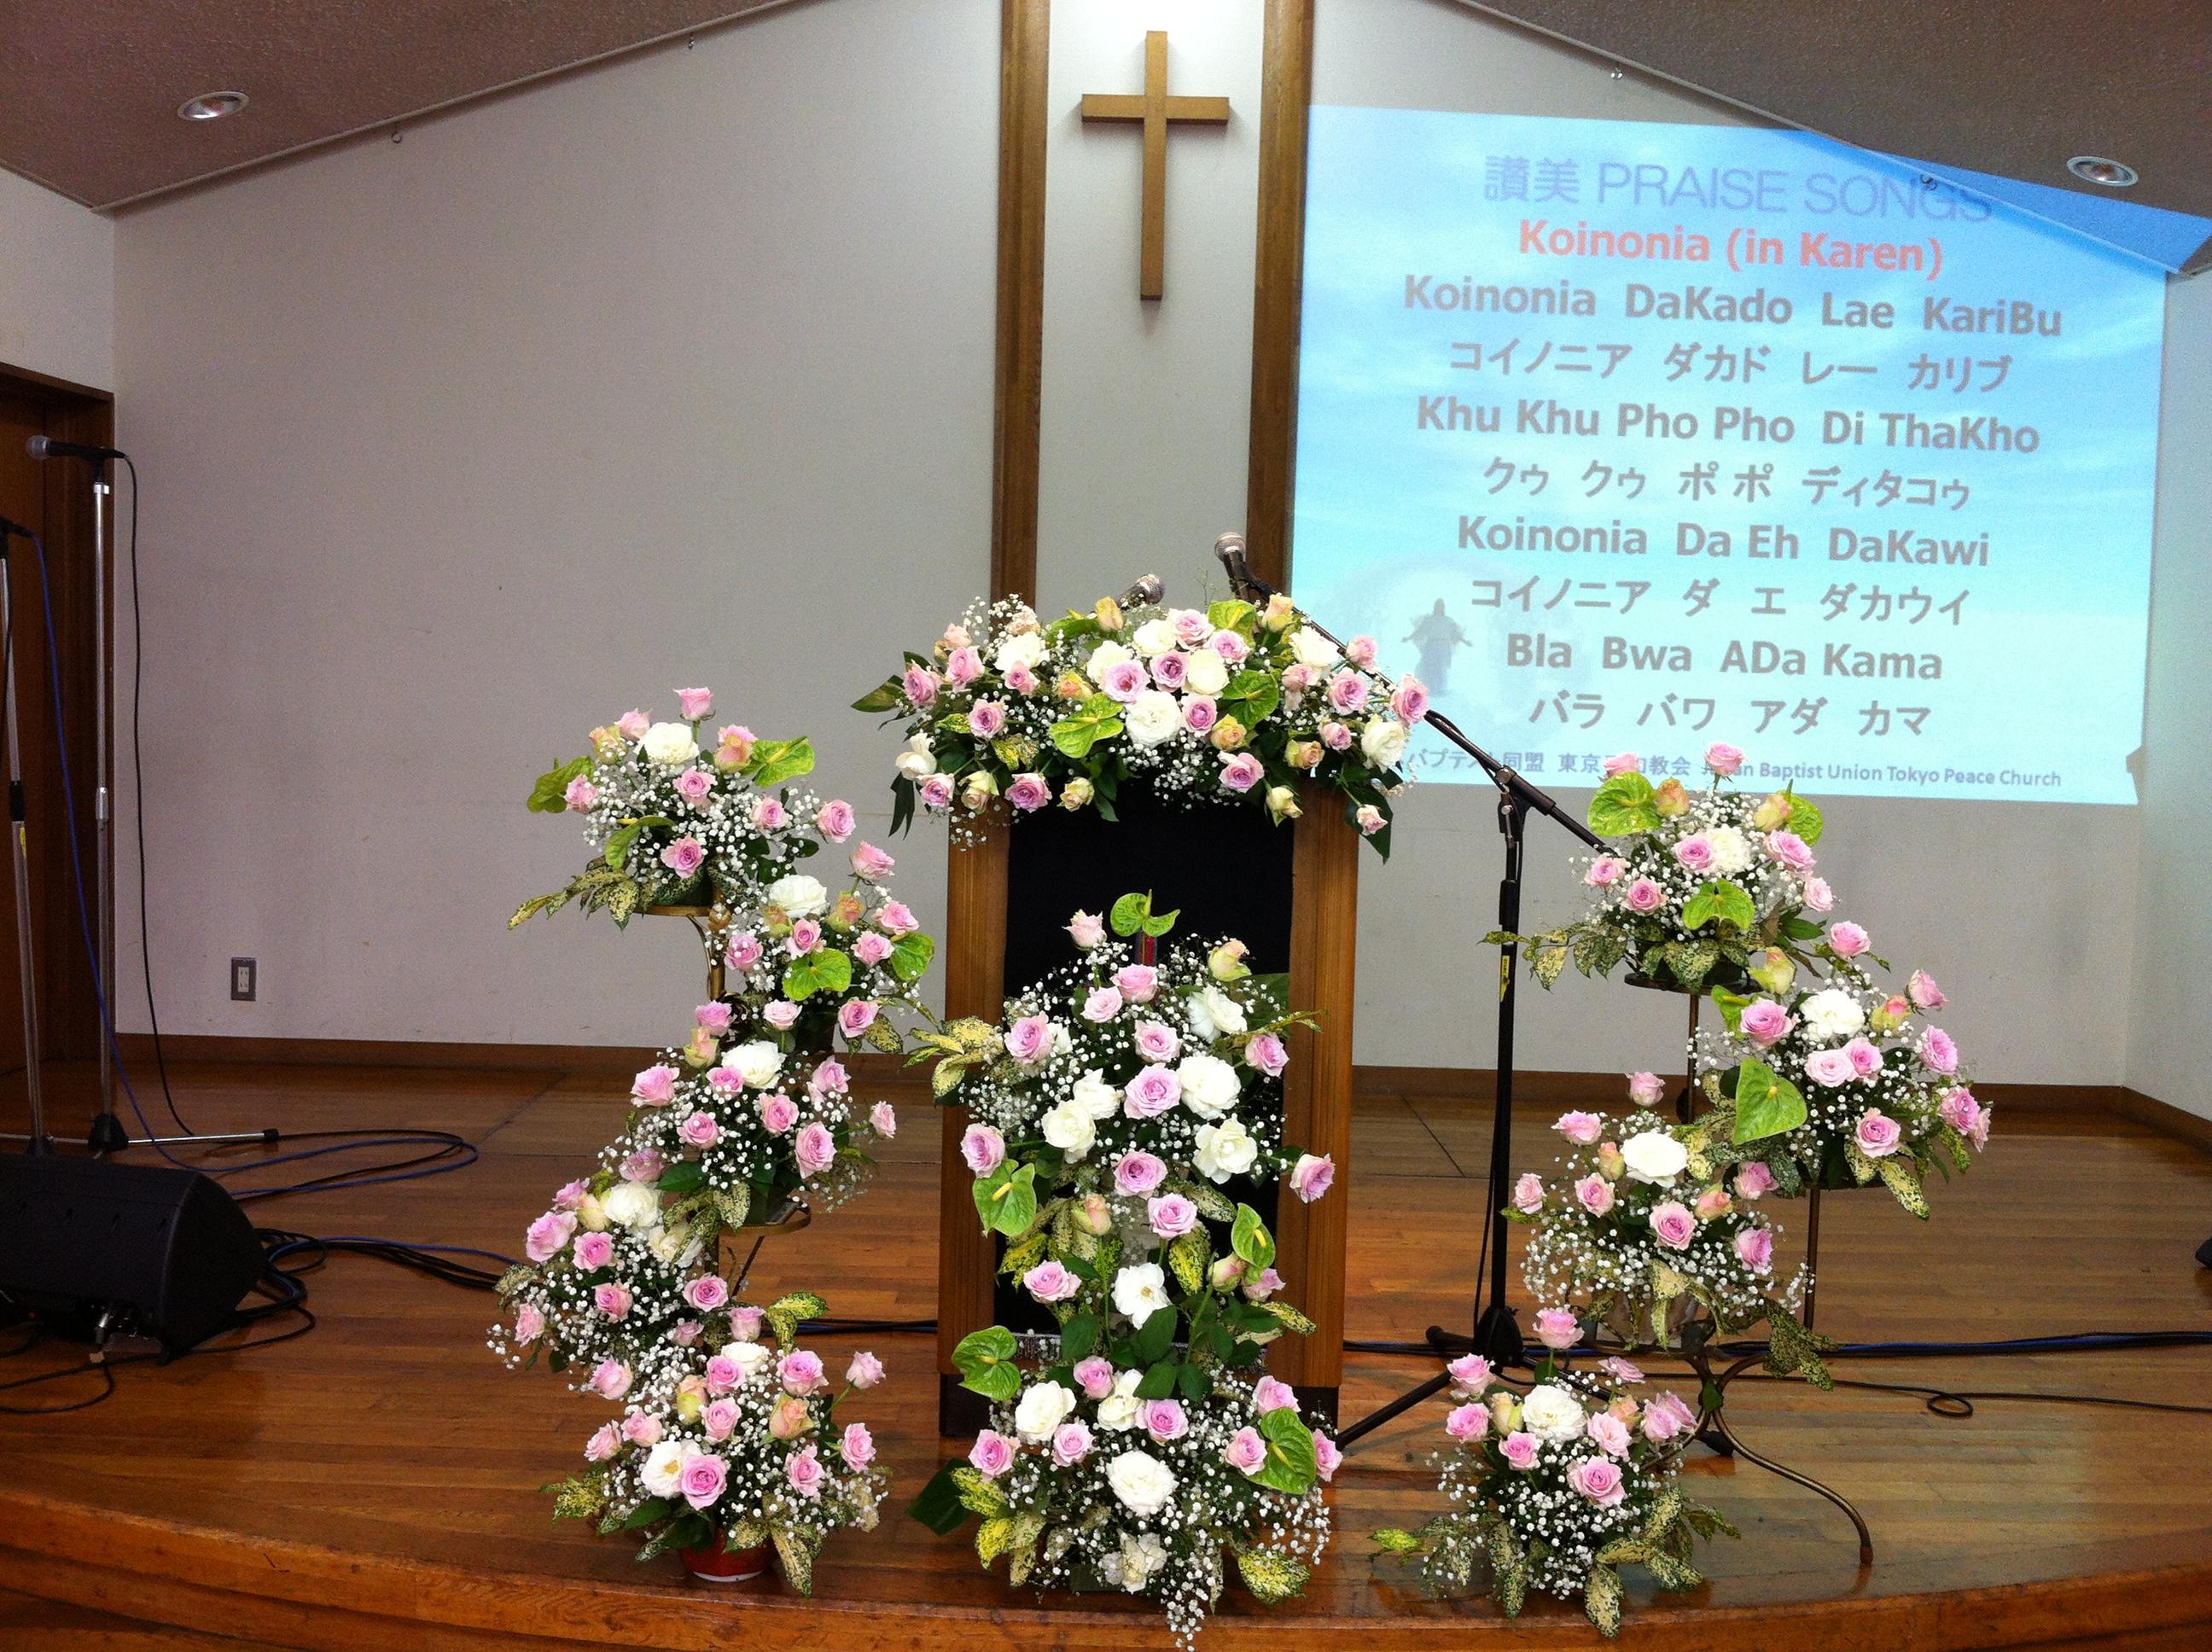 東京平和教会 早稲田チャペル 内